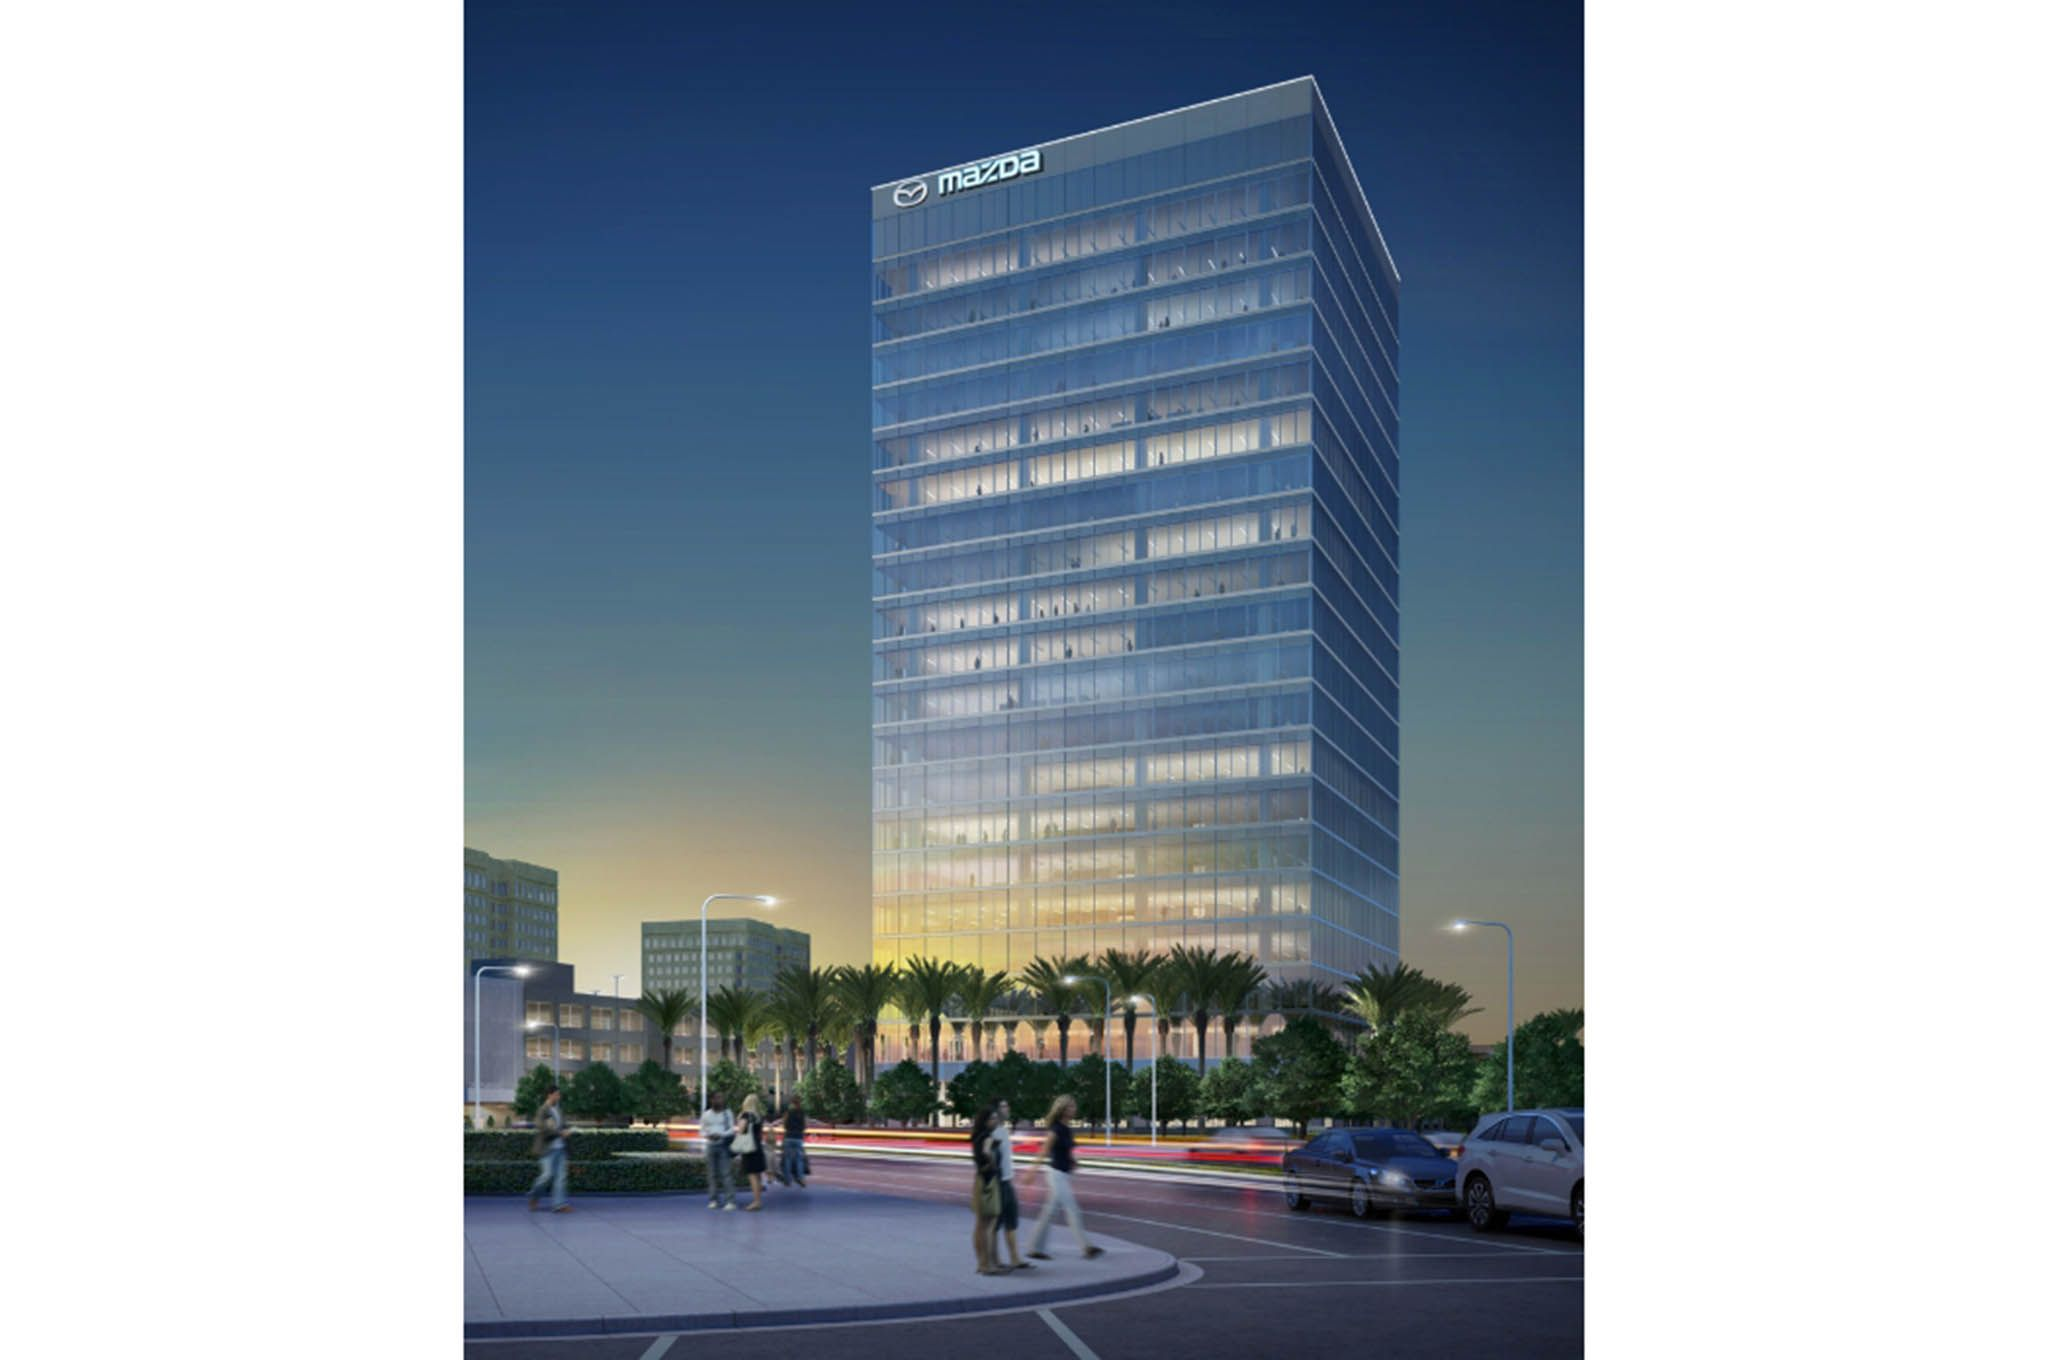 Mazda To Relocate To New California Headquarters In 2017 Relocation Irvine Spectrum Irvine